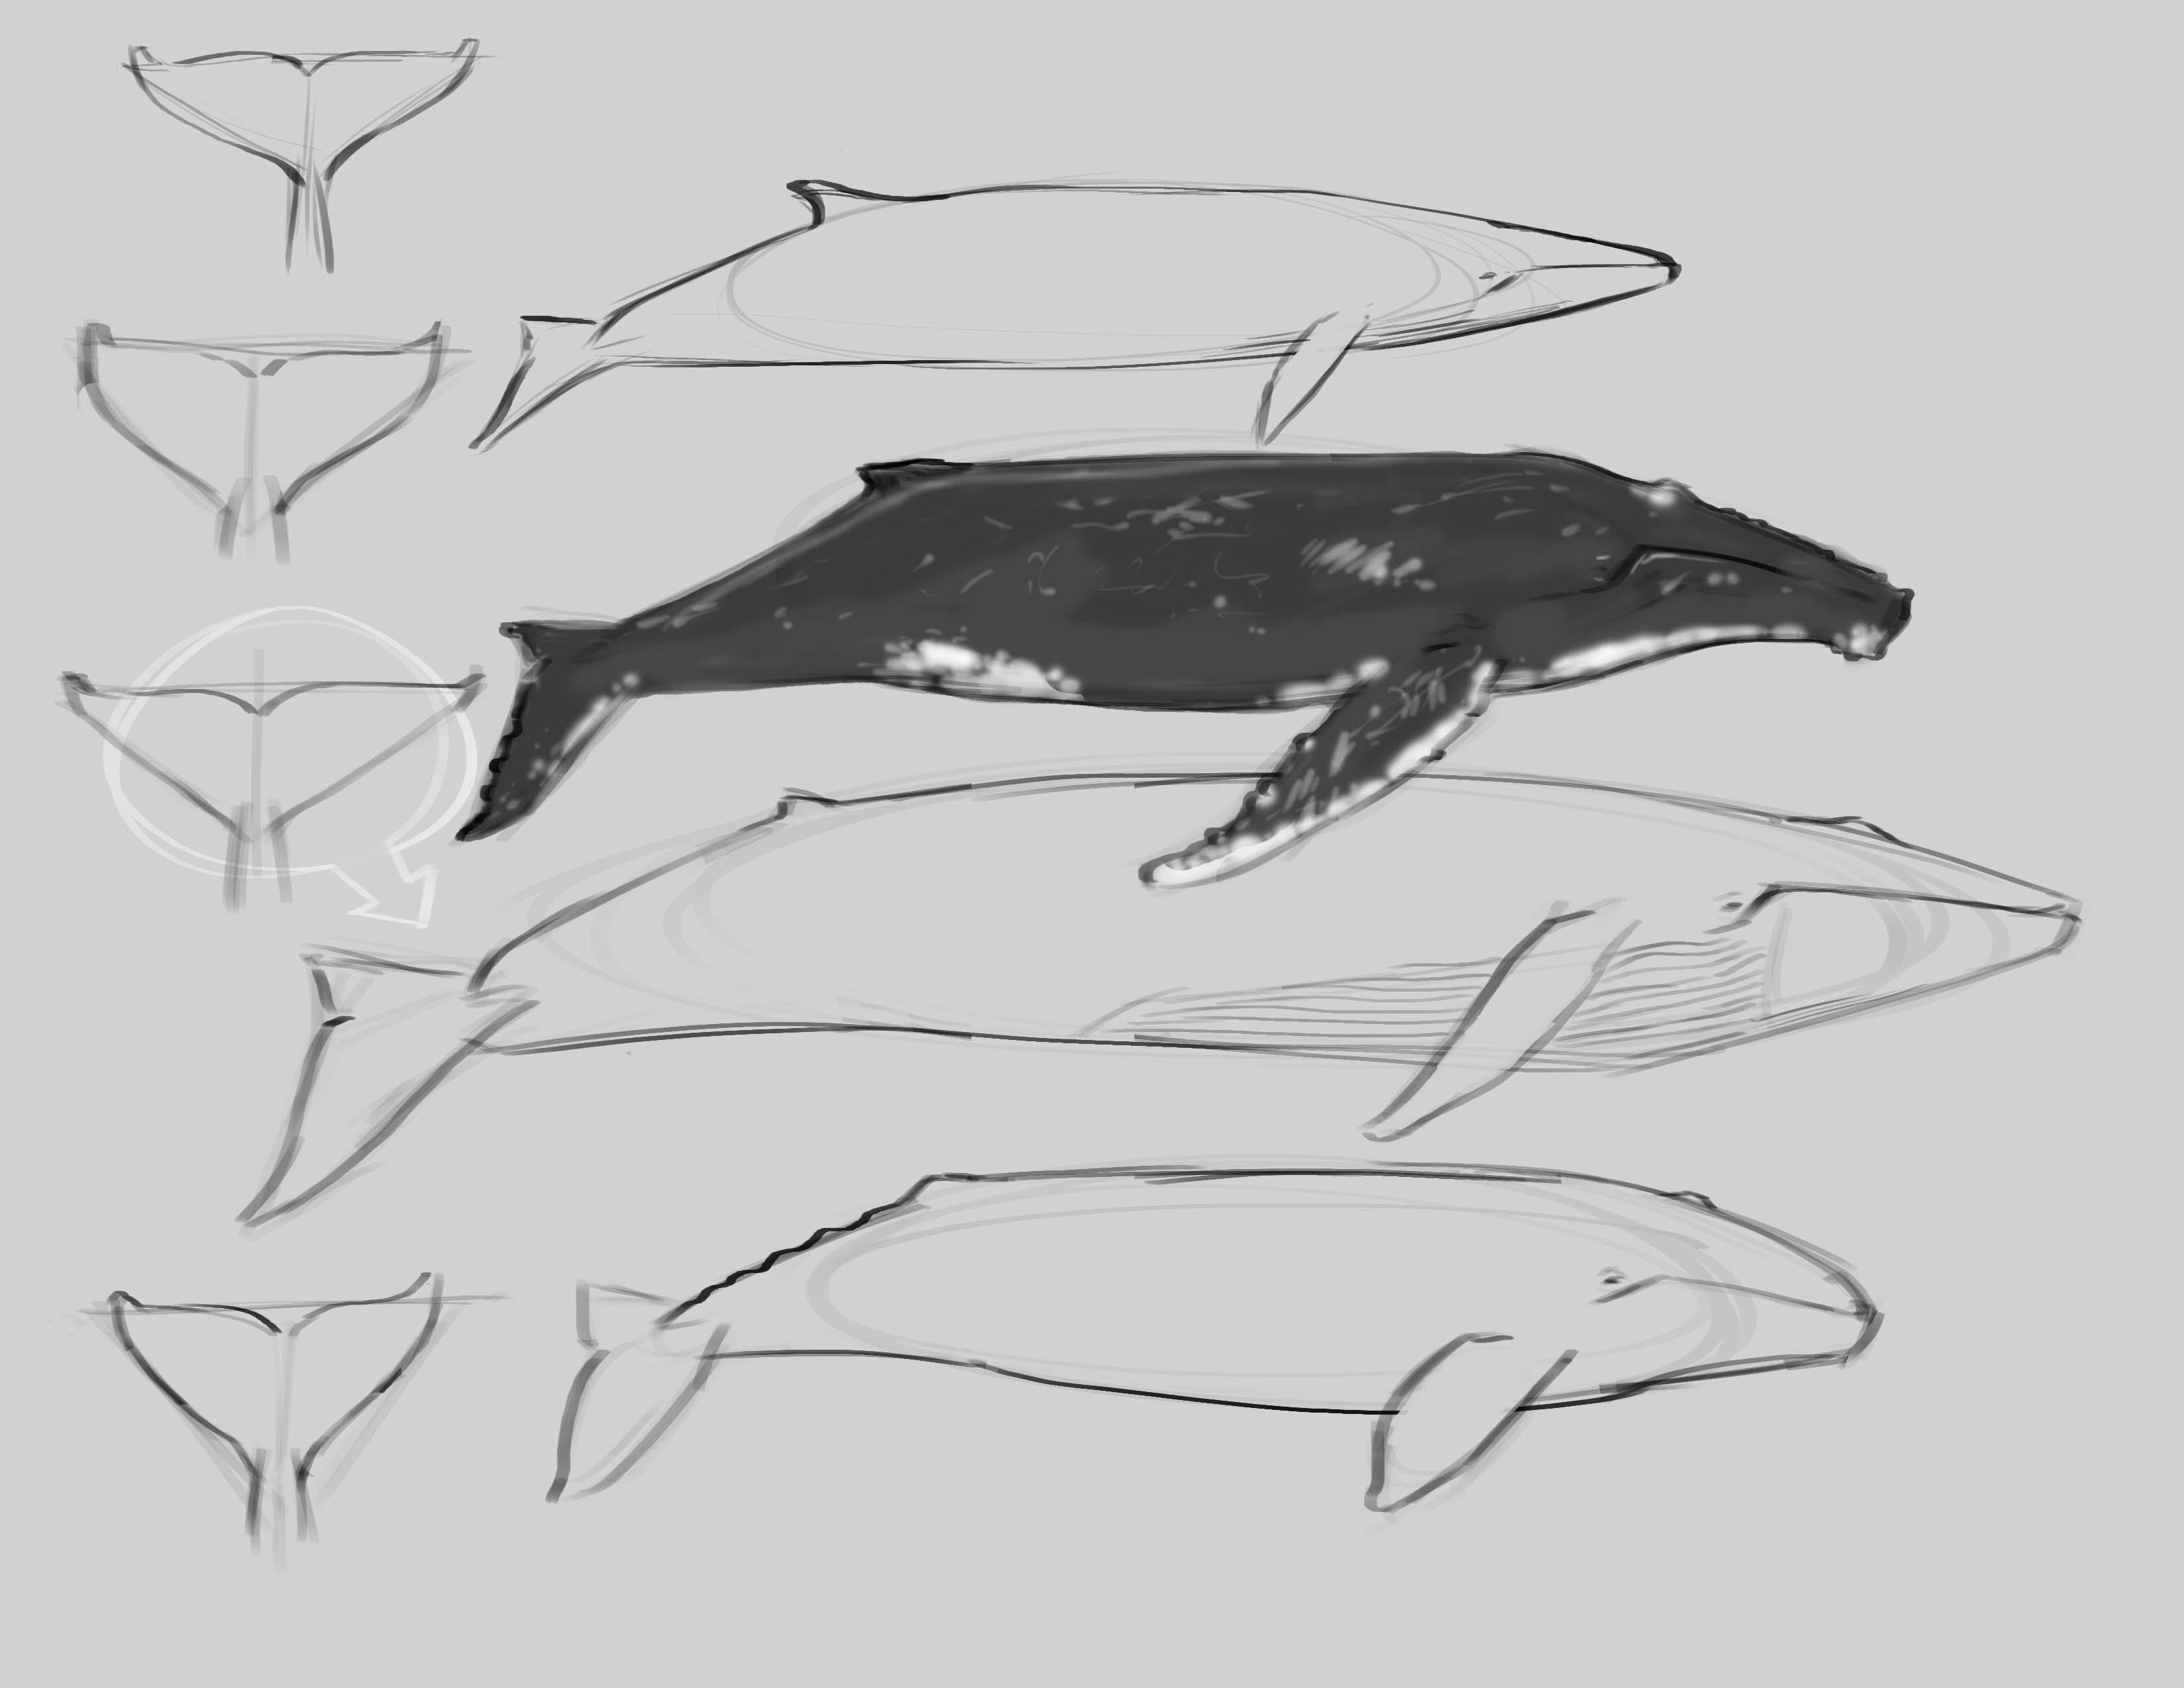 Whale Anatomy 1.10 - John Muir Laws